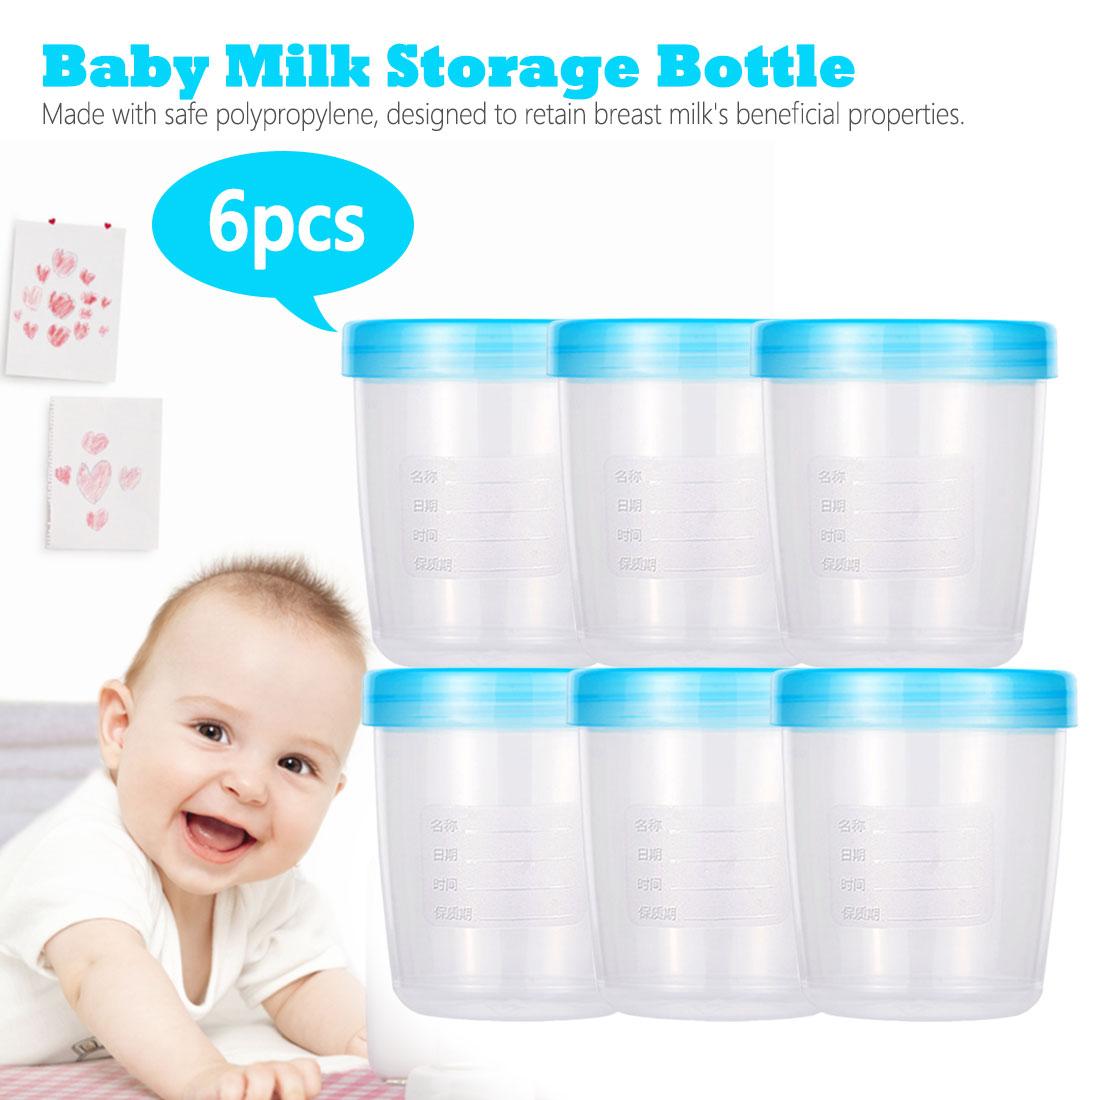 6pcs 180ml Breast Milk Storage Bottle Wide Neck Infant Newborn Fresh-keeping Cup Food Freezer Baby Food Supplement Box